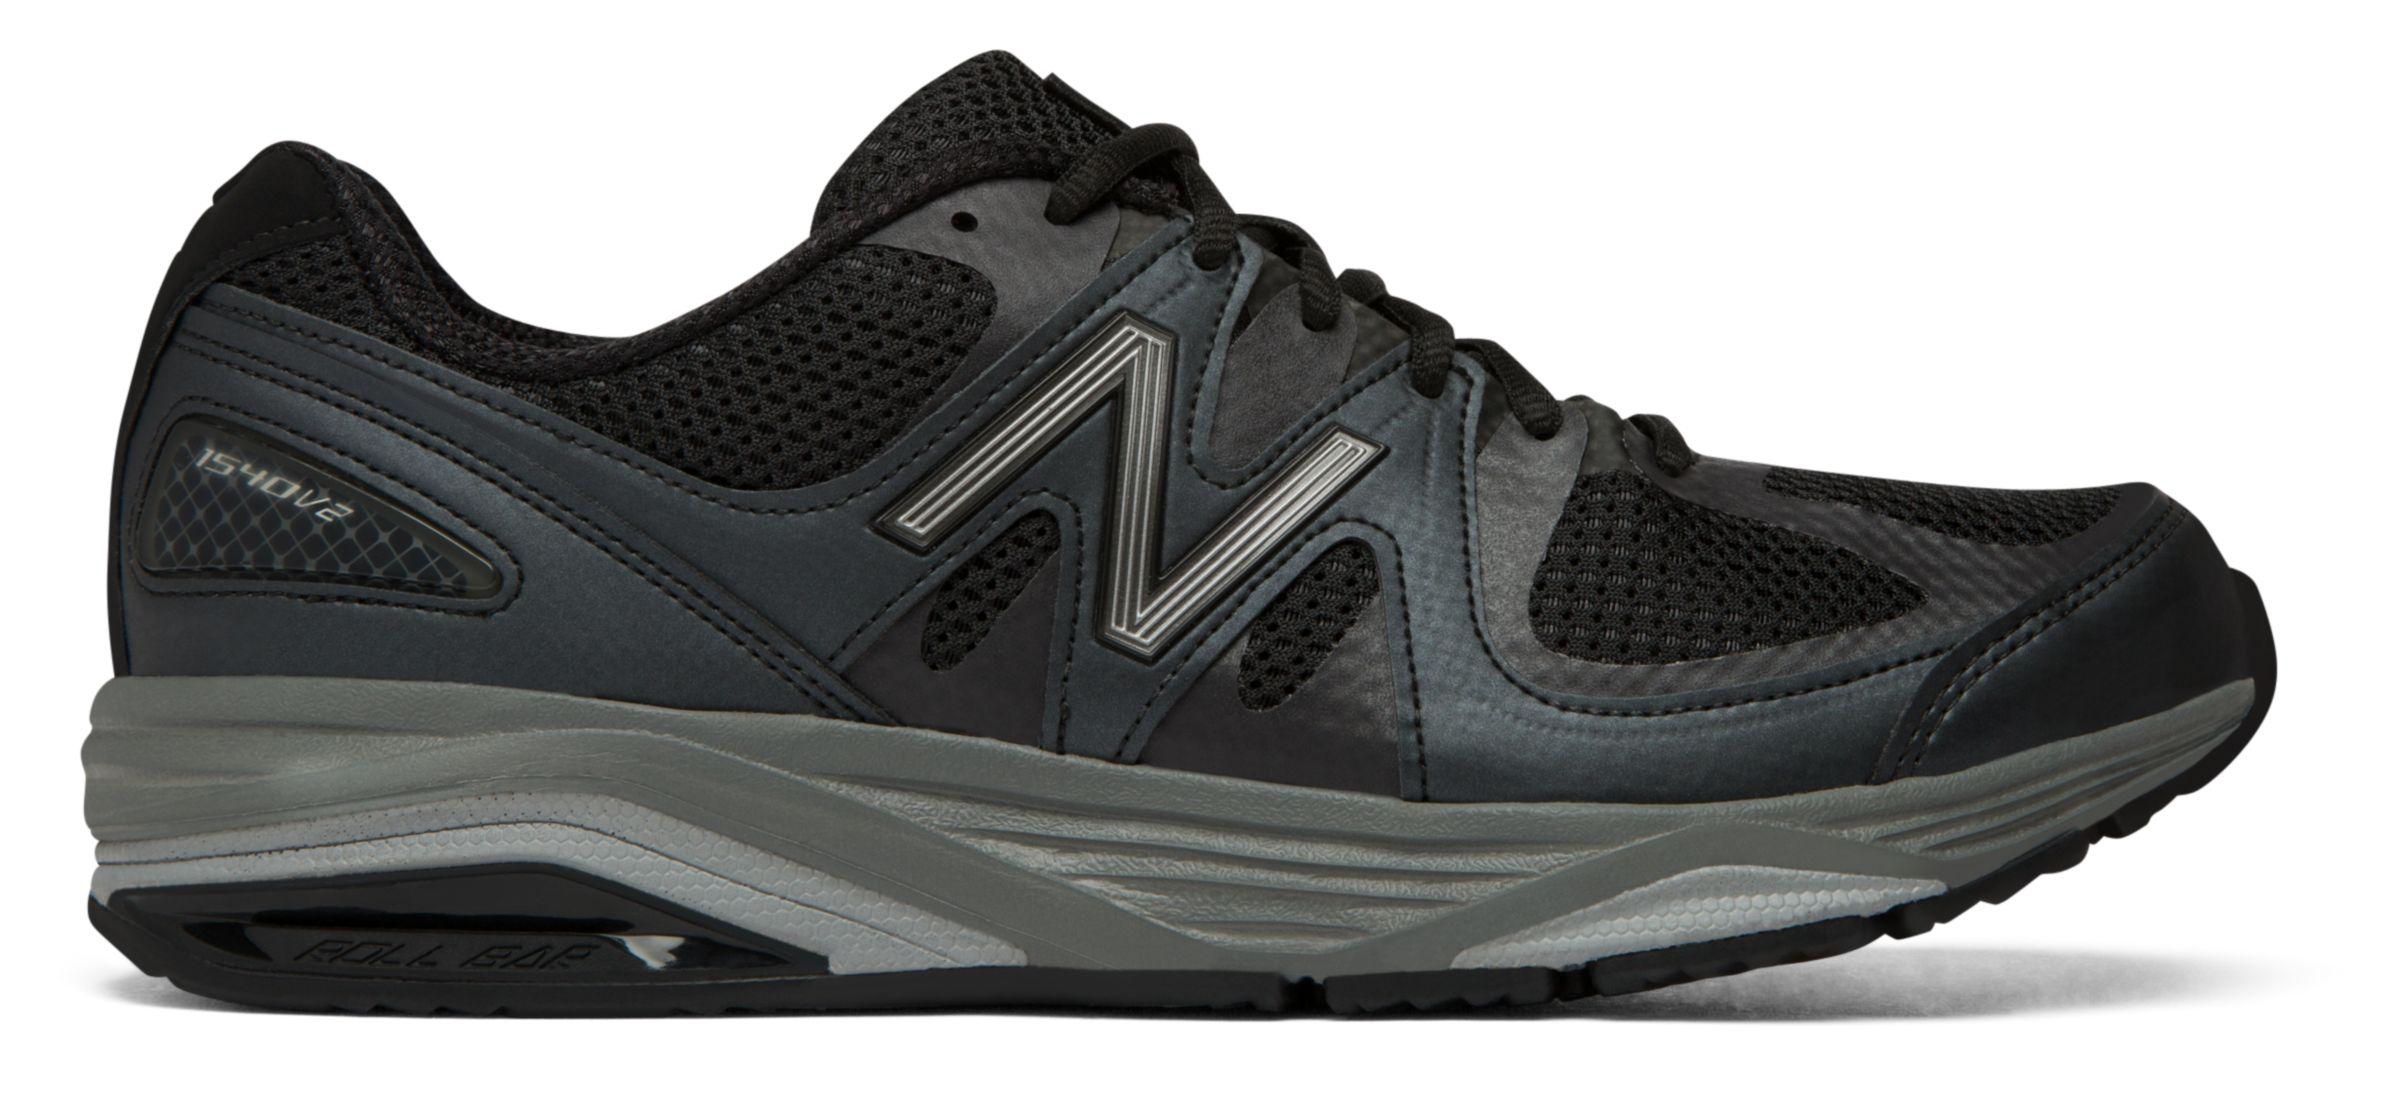 New Balance 1540 gris